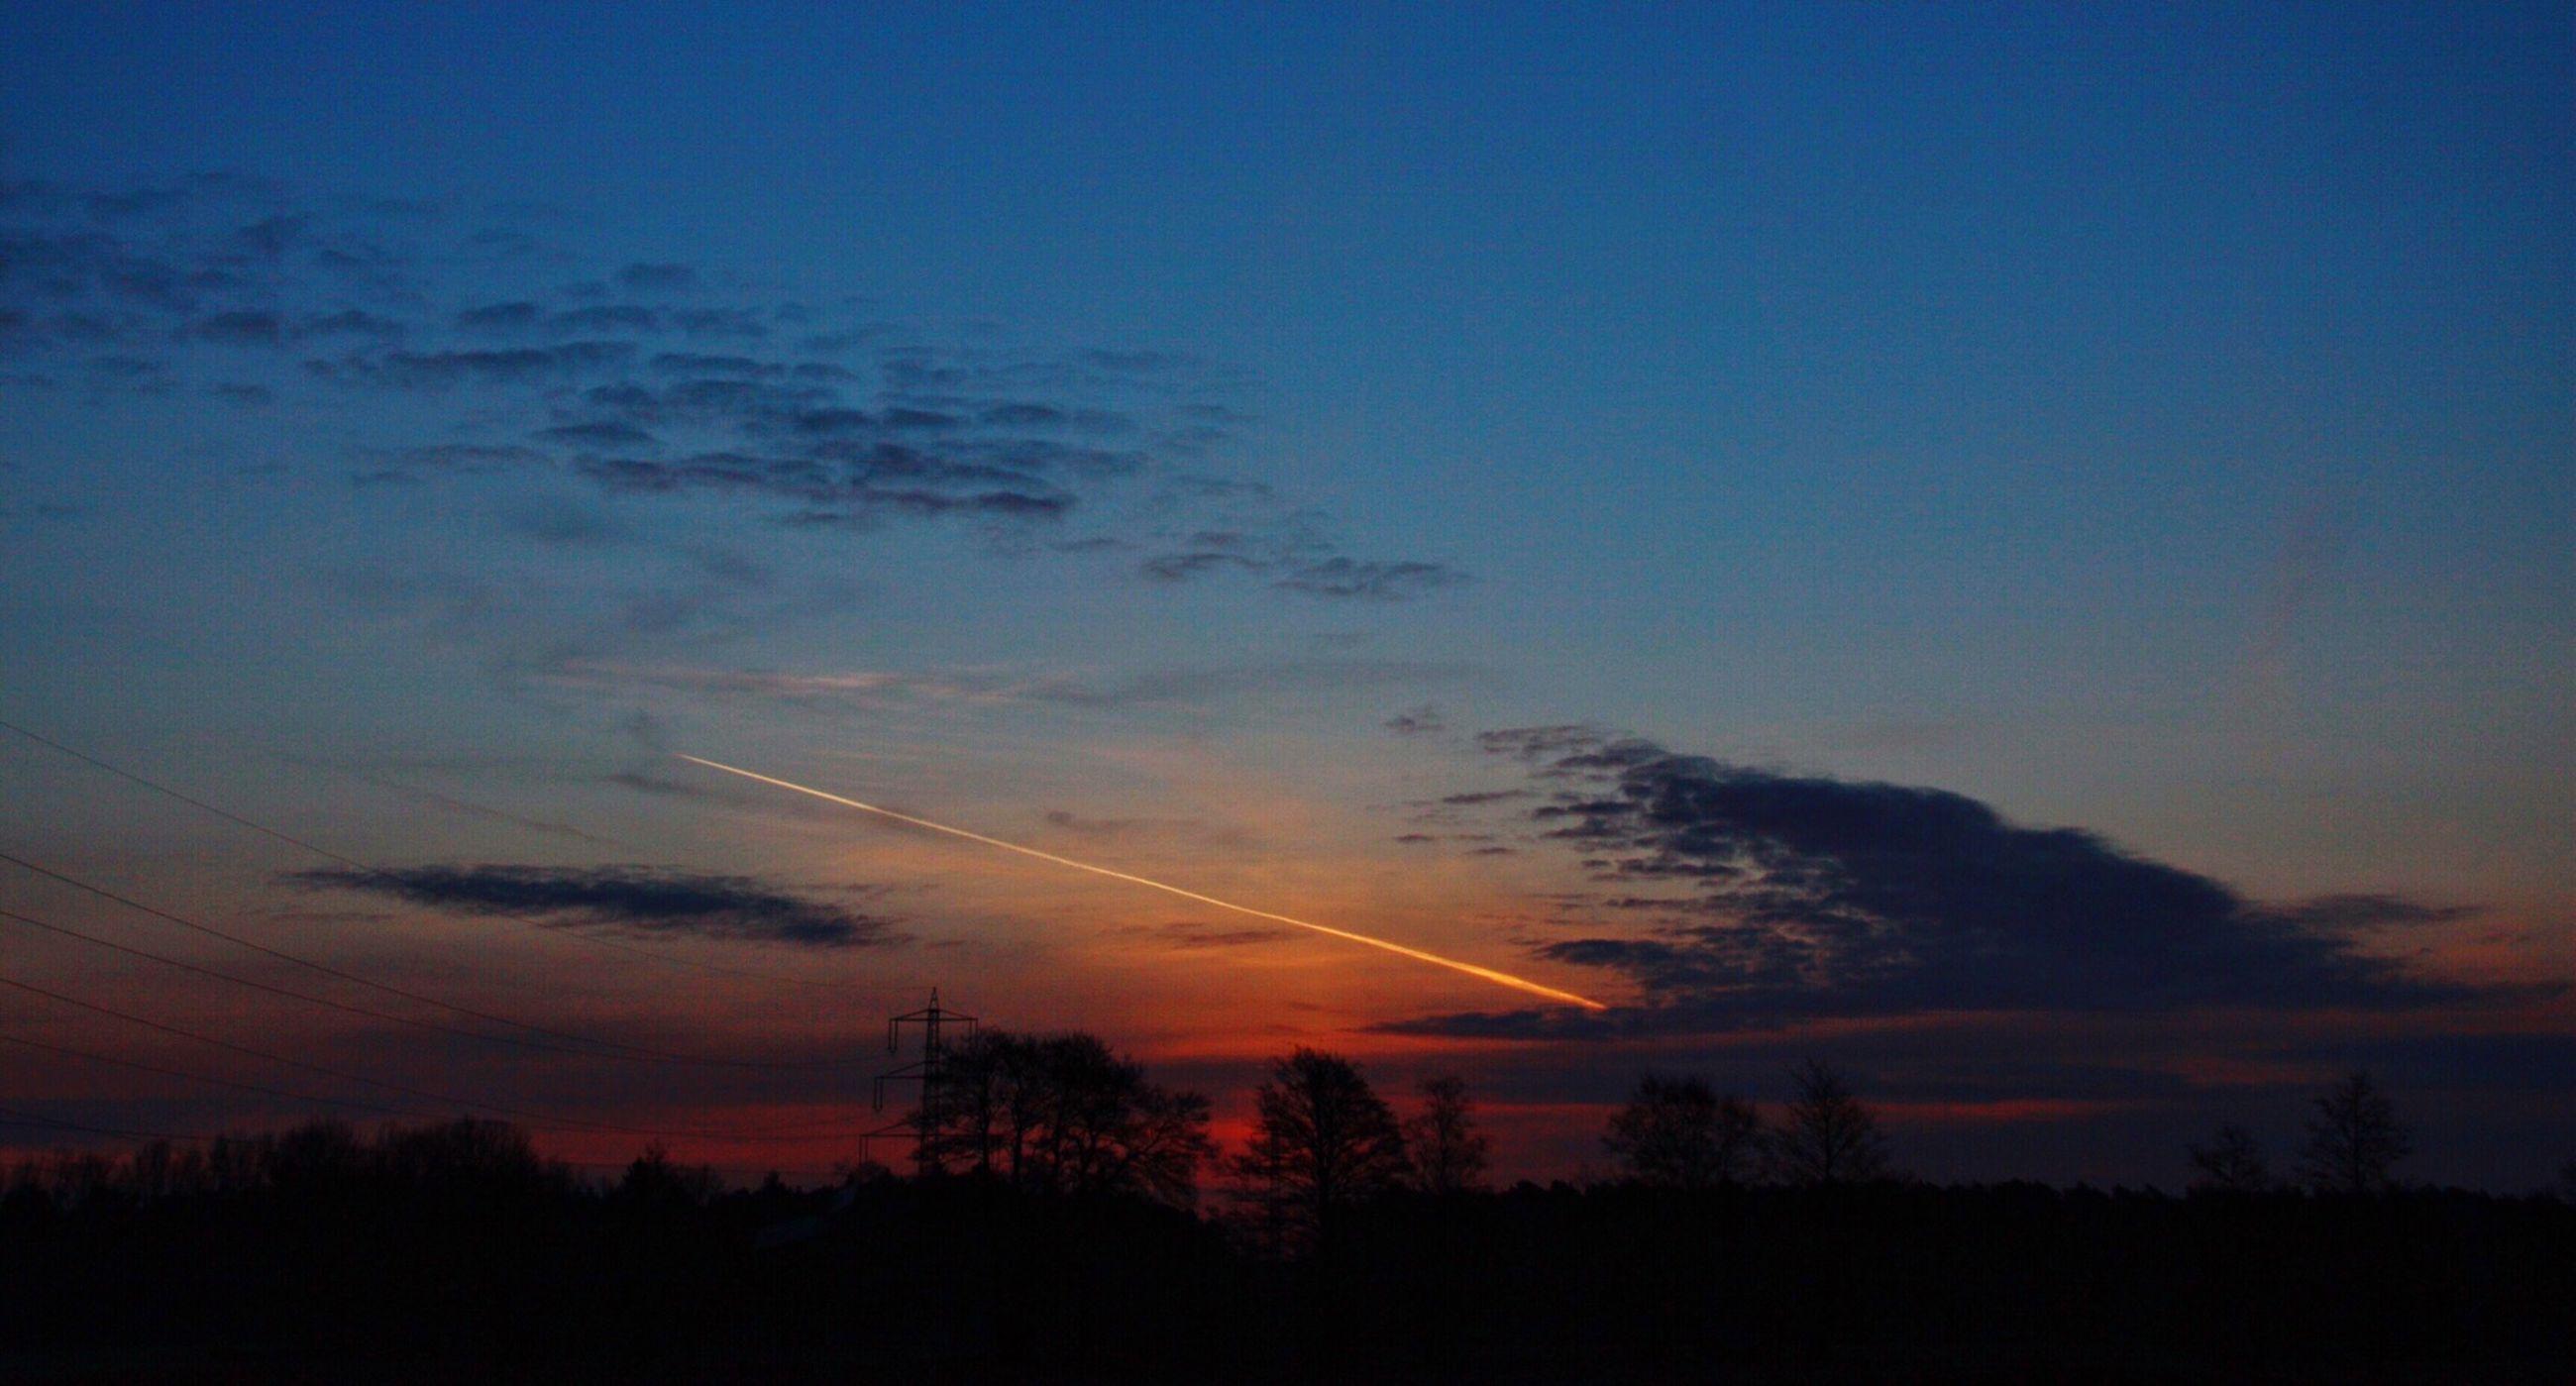 sunset, silhouette, scenics, tranquility, tranquil scene, beauty in nature, tree, sky, nature, landscape, idyllic, orange color, cloud - sky, dusk, blue, outdoors, vapor trail, copy space, no people, majestic